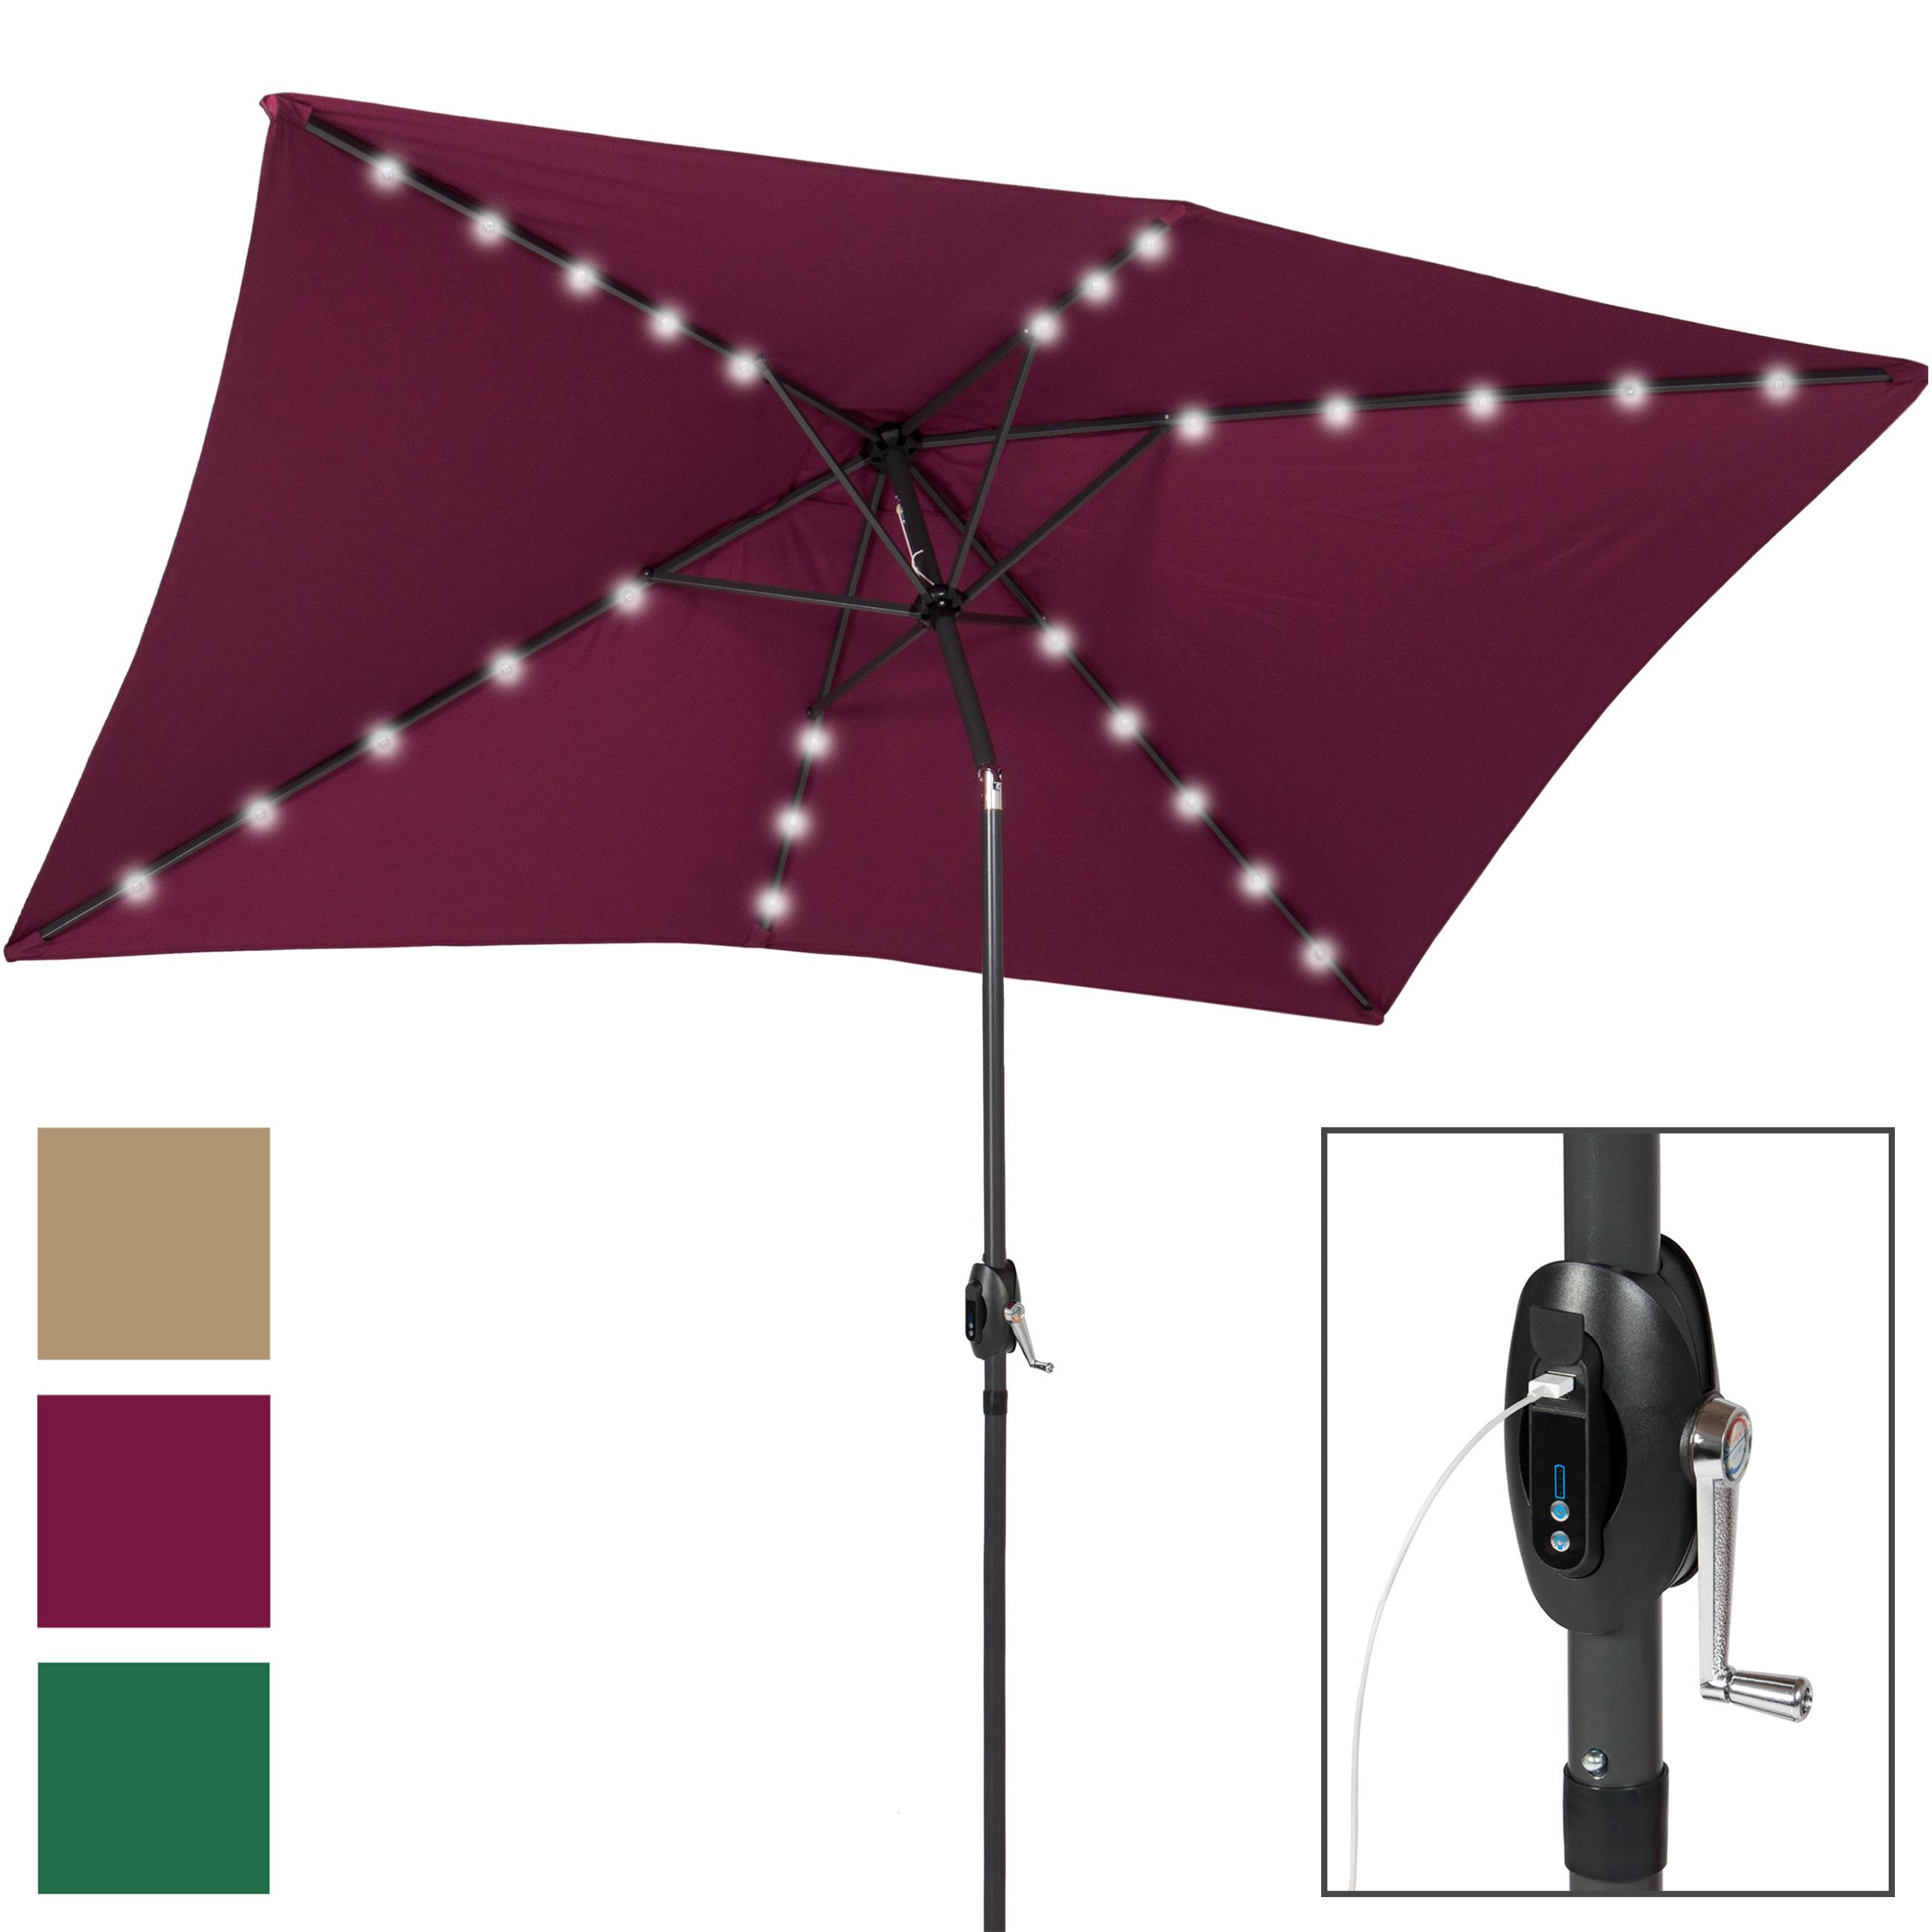 Best Choice Products 10x6.5ft Rectangular Solar LED Patio Umbrella w/ USB Charger, Portable Power Bank, Tilt